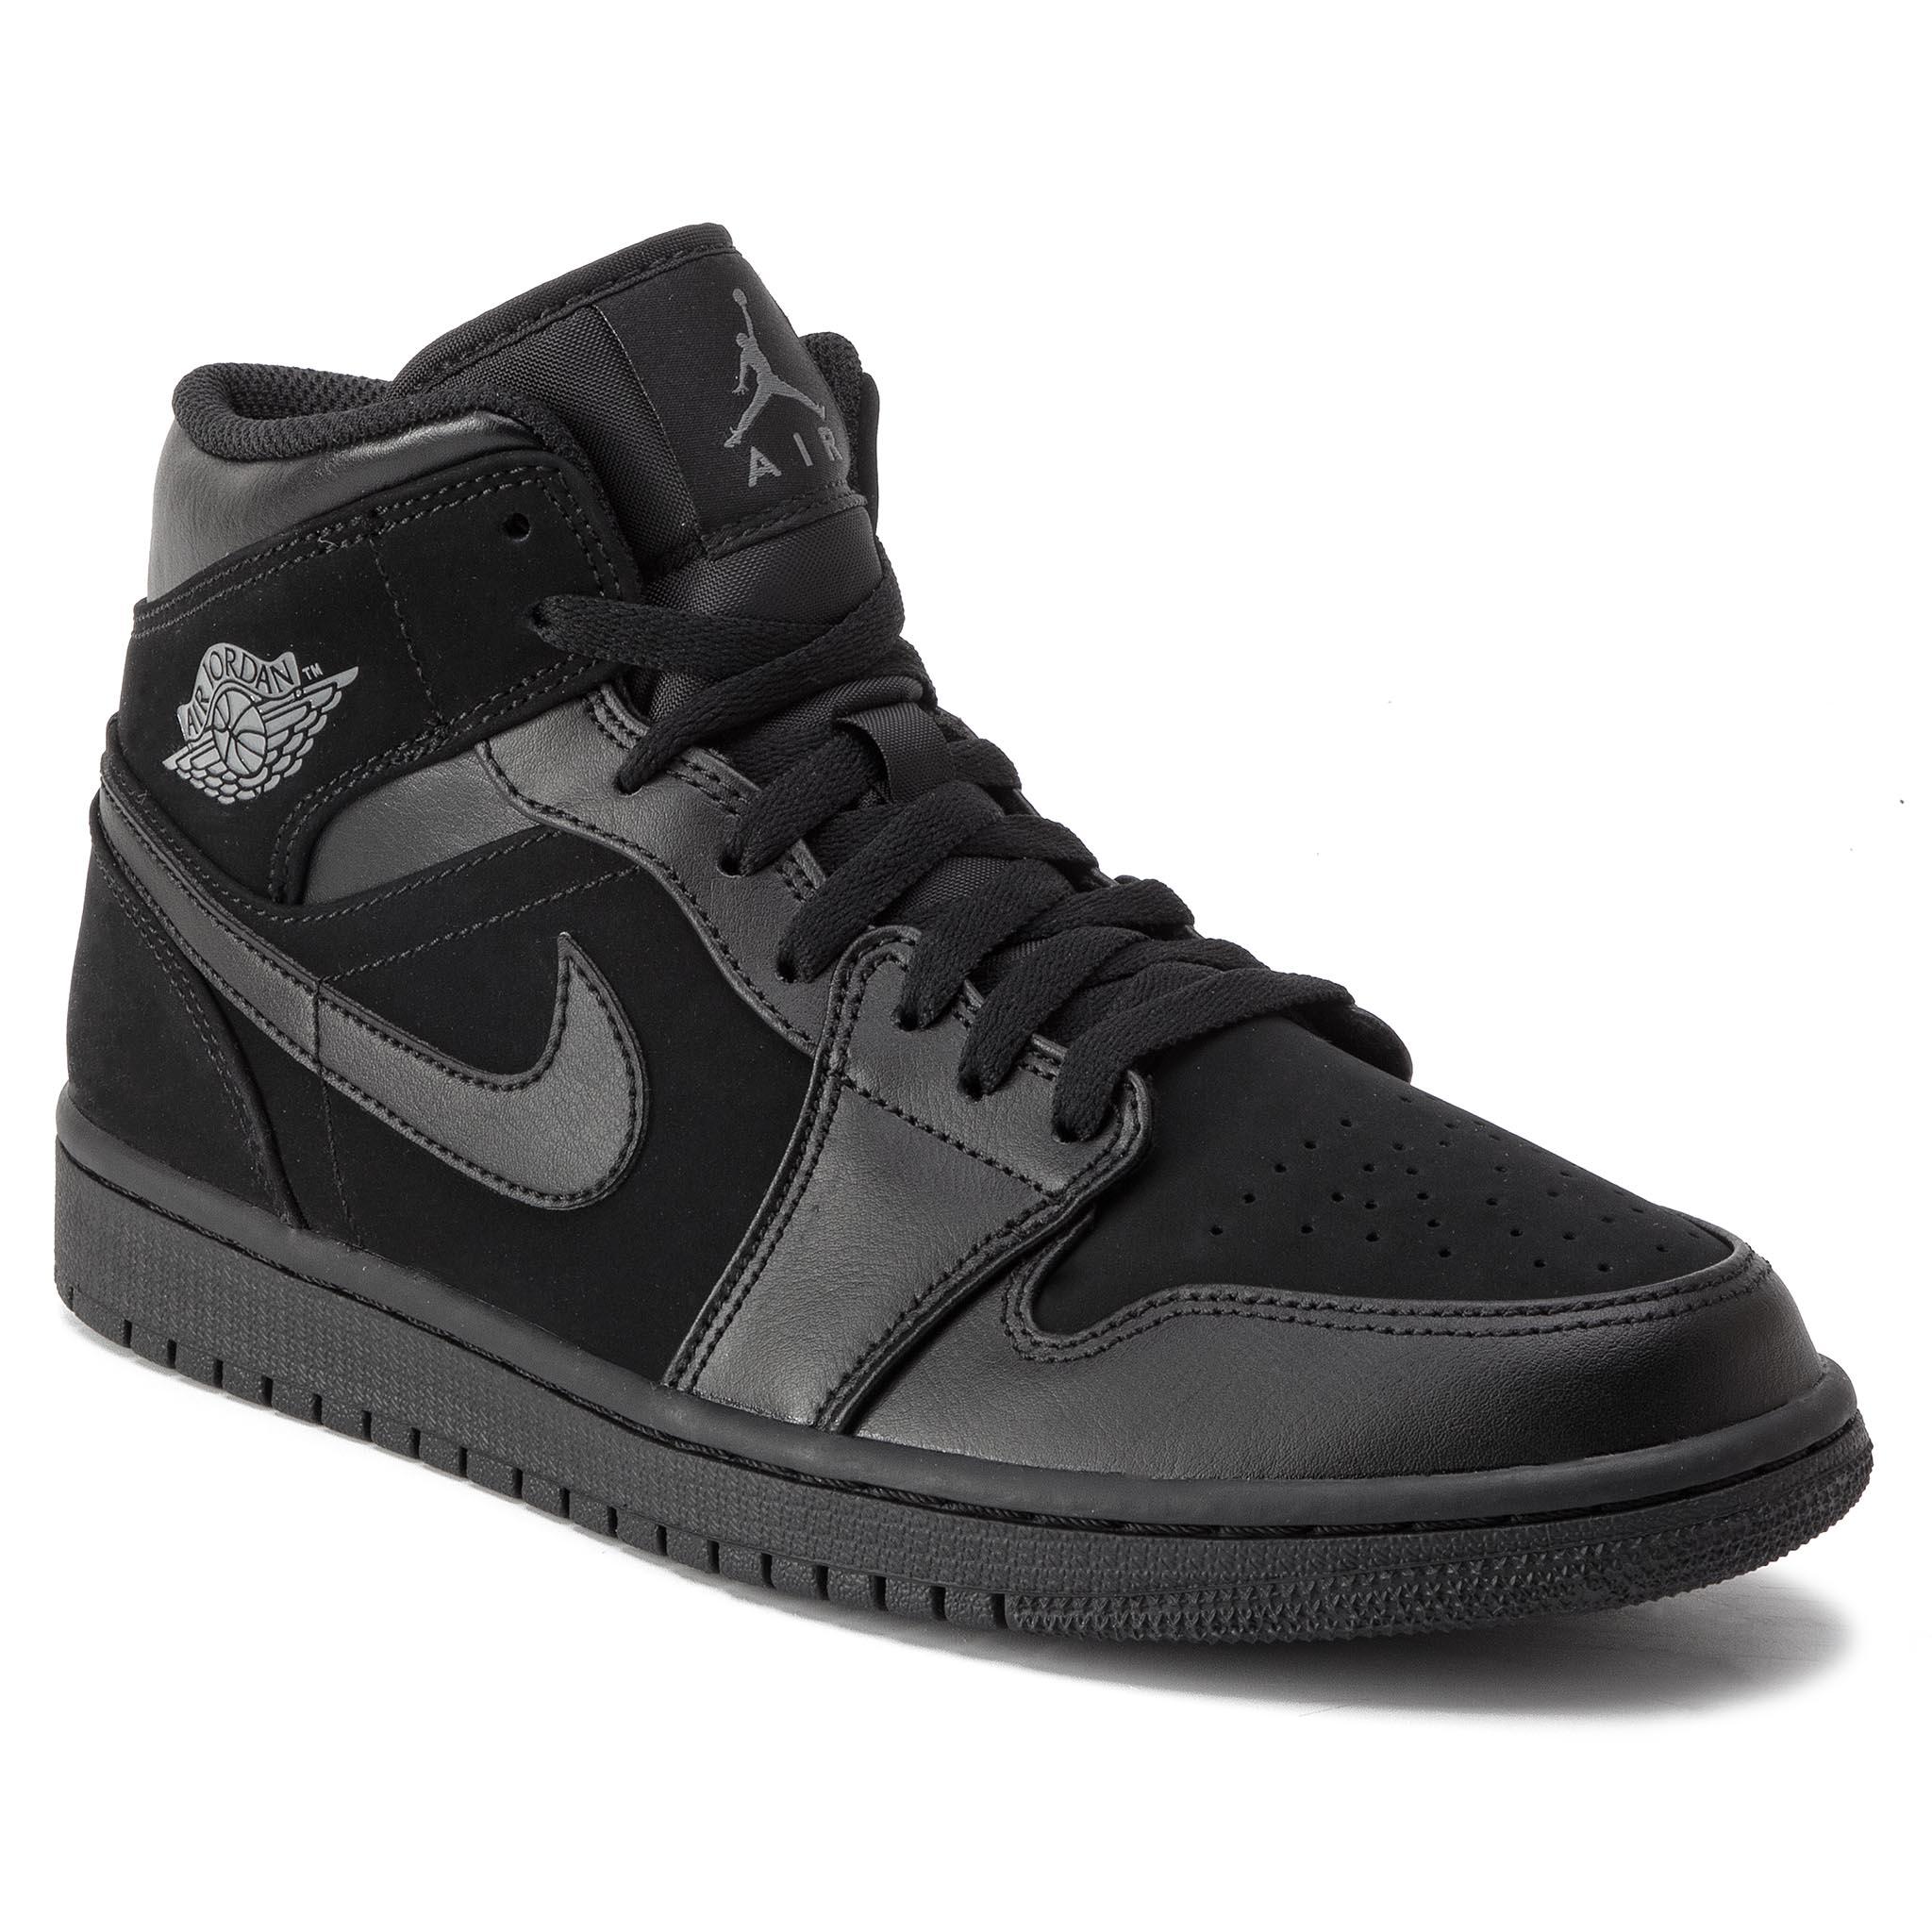 on sale 40946 1c41a Shoes NIKE Air Jordan 1 Mid 554724 050 Black Dark Grey Black